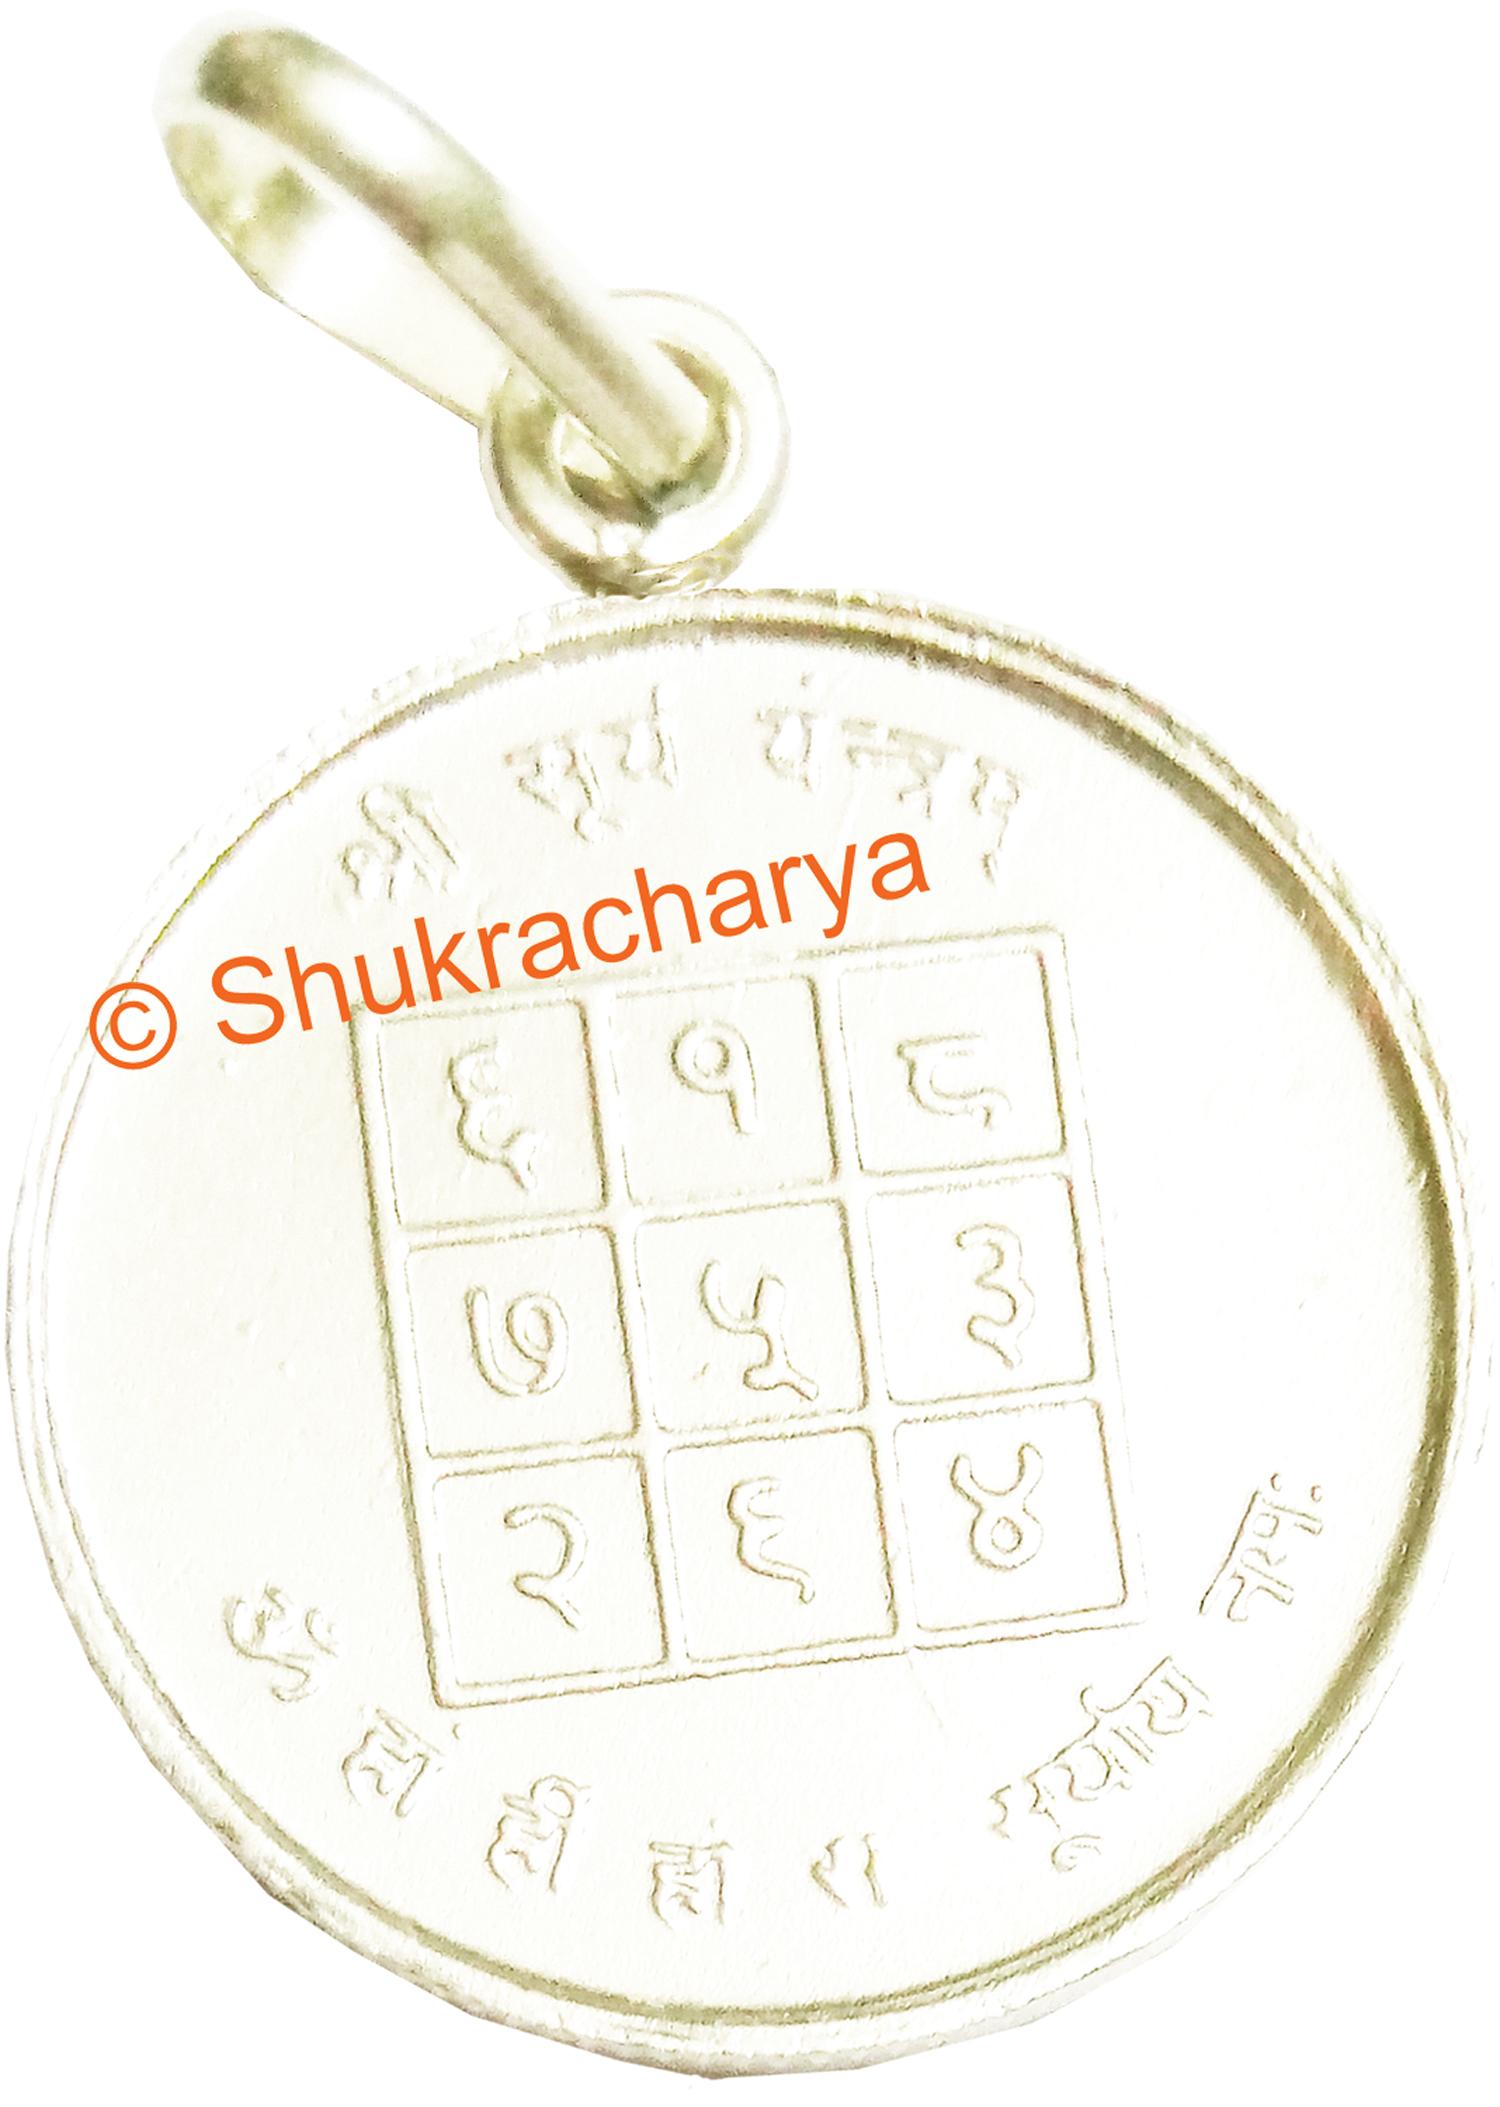 Astrology Remedial Products, Rudraksh, pooja samagri, vastu